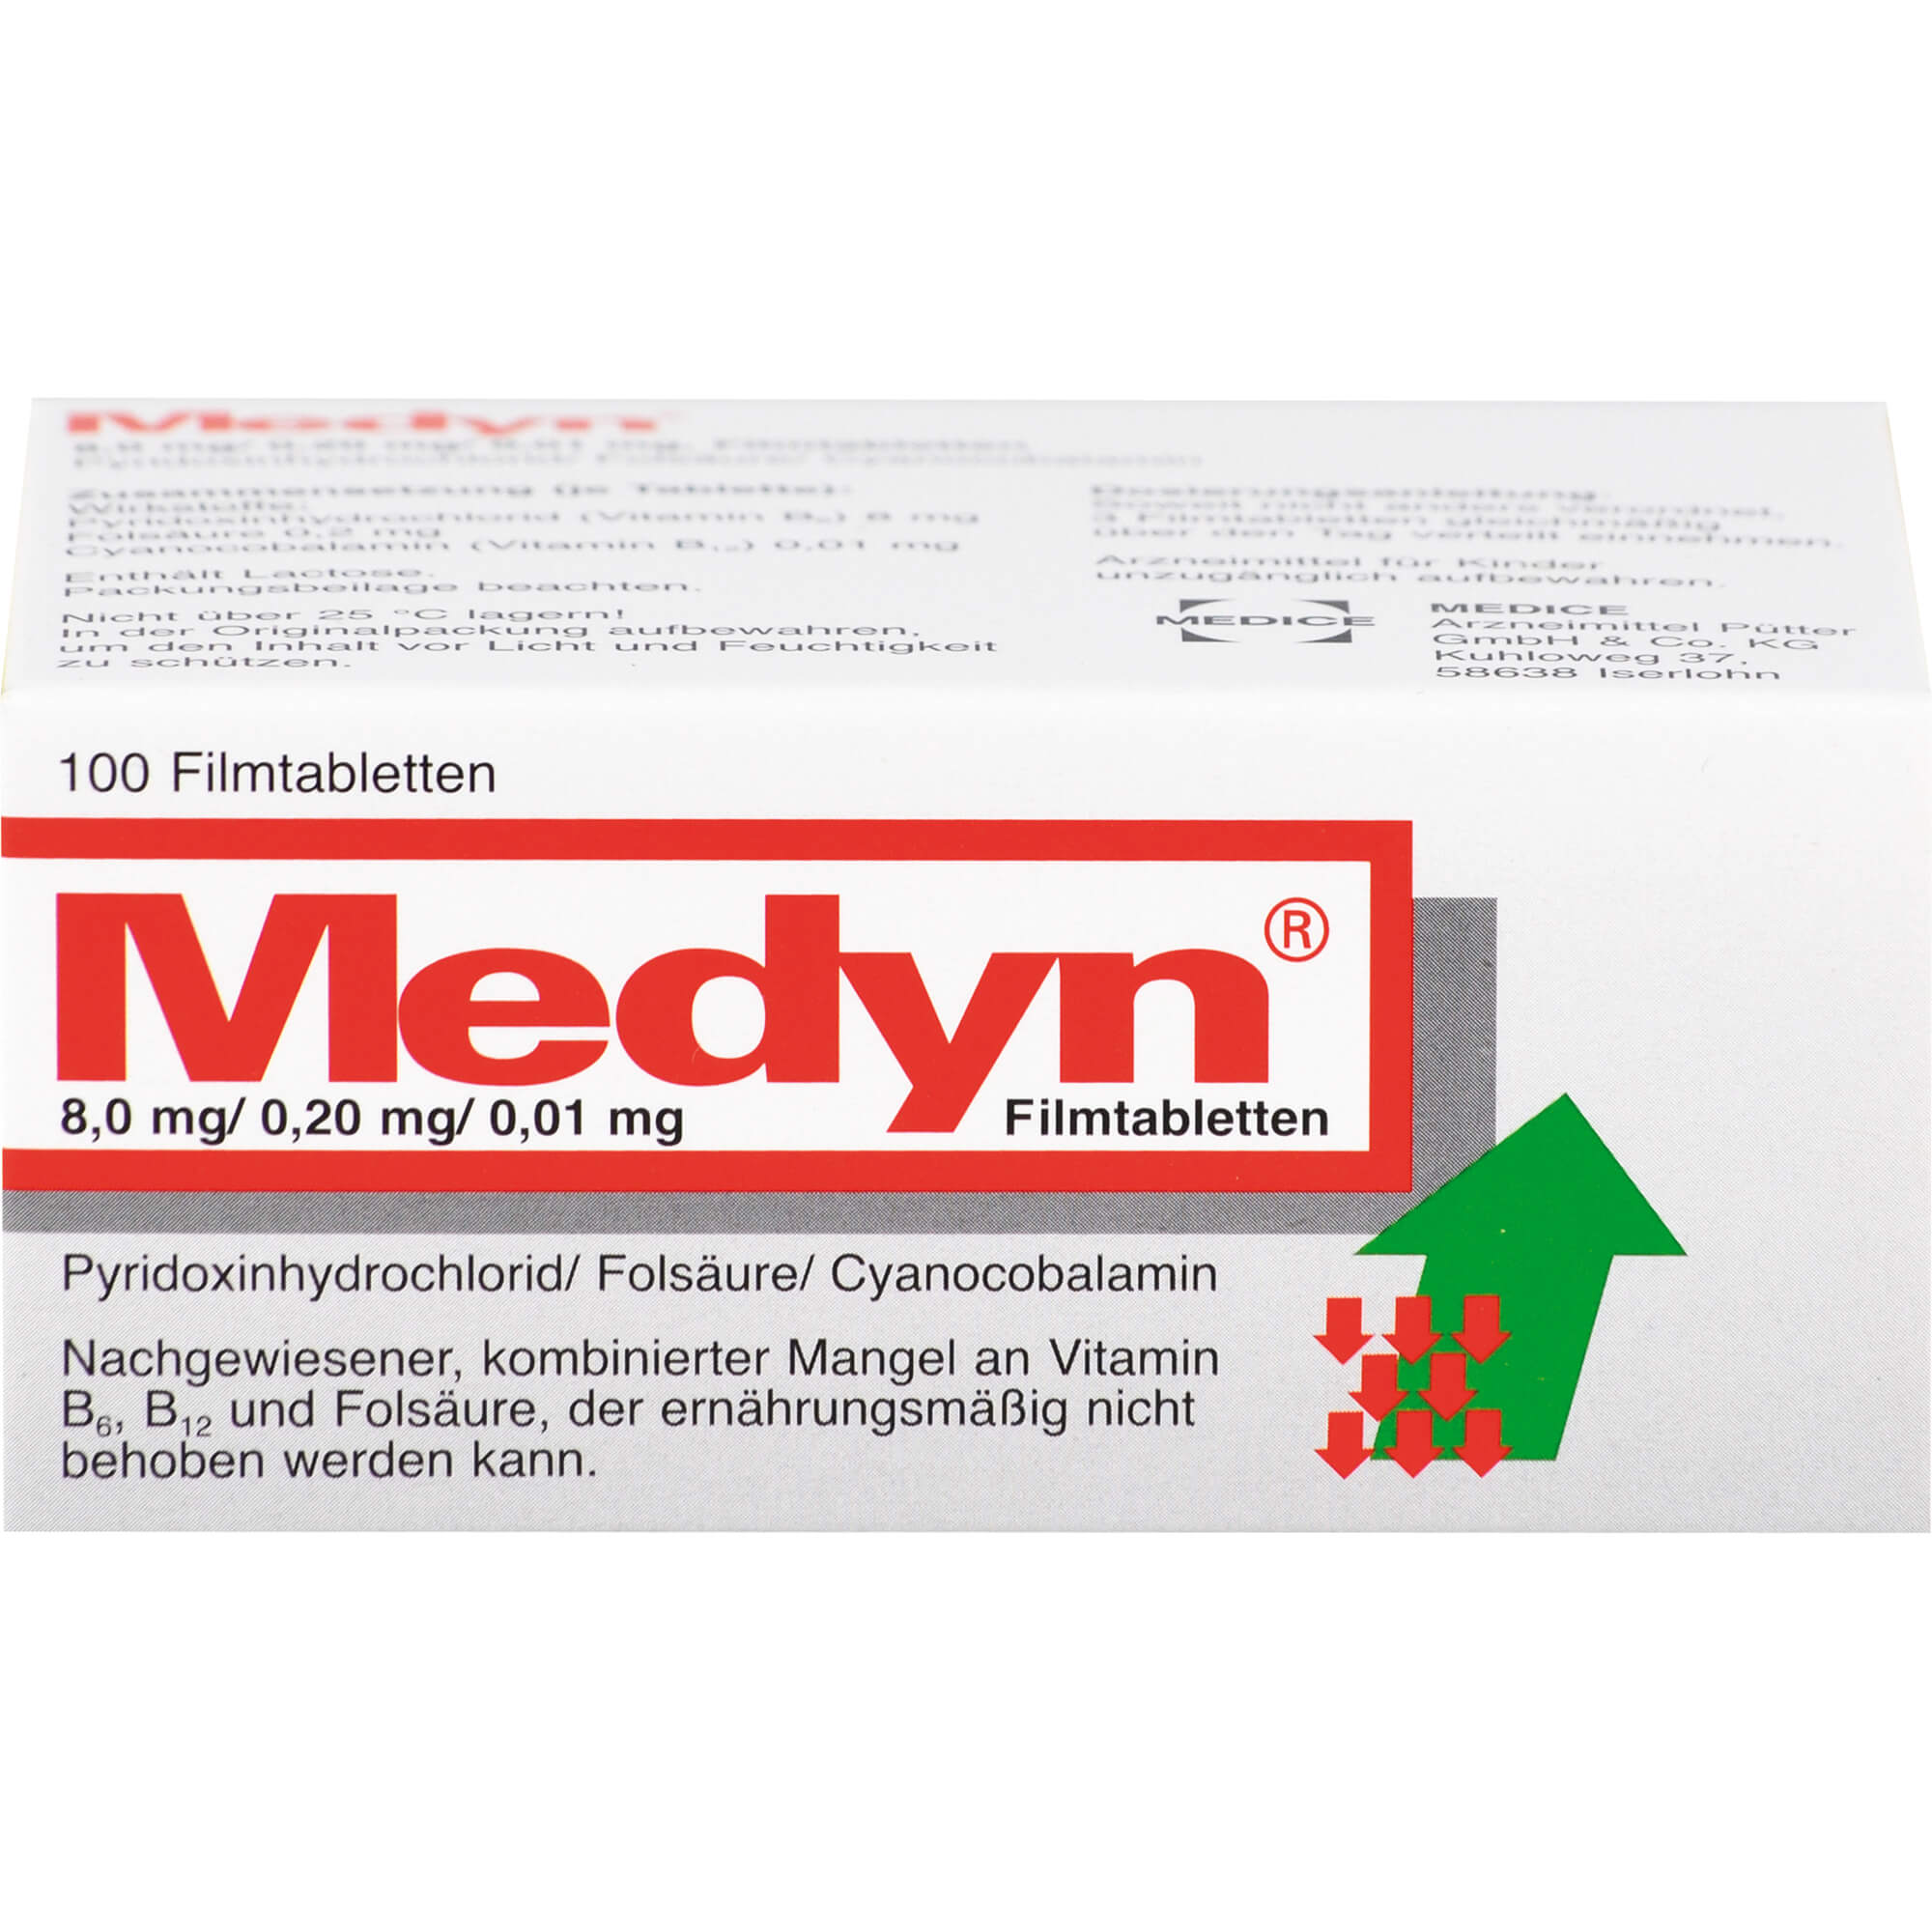 MEDYN Filmtabletten